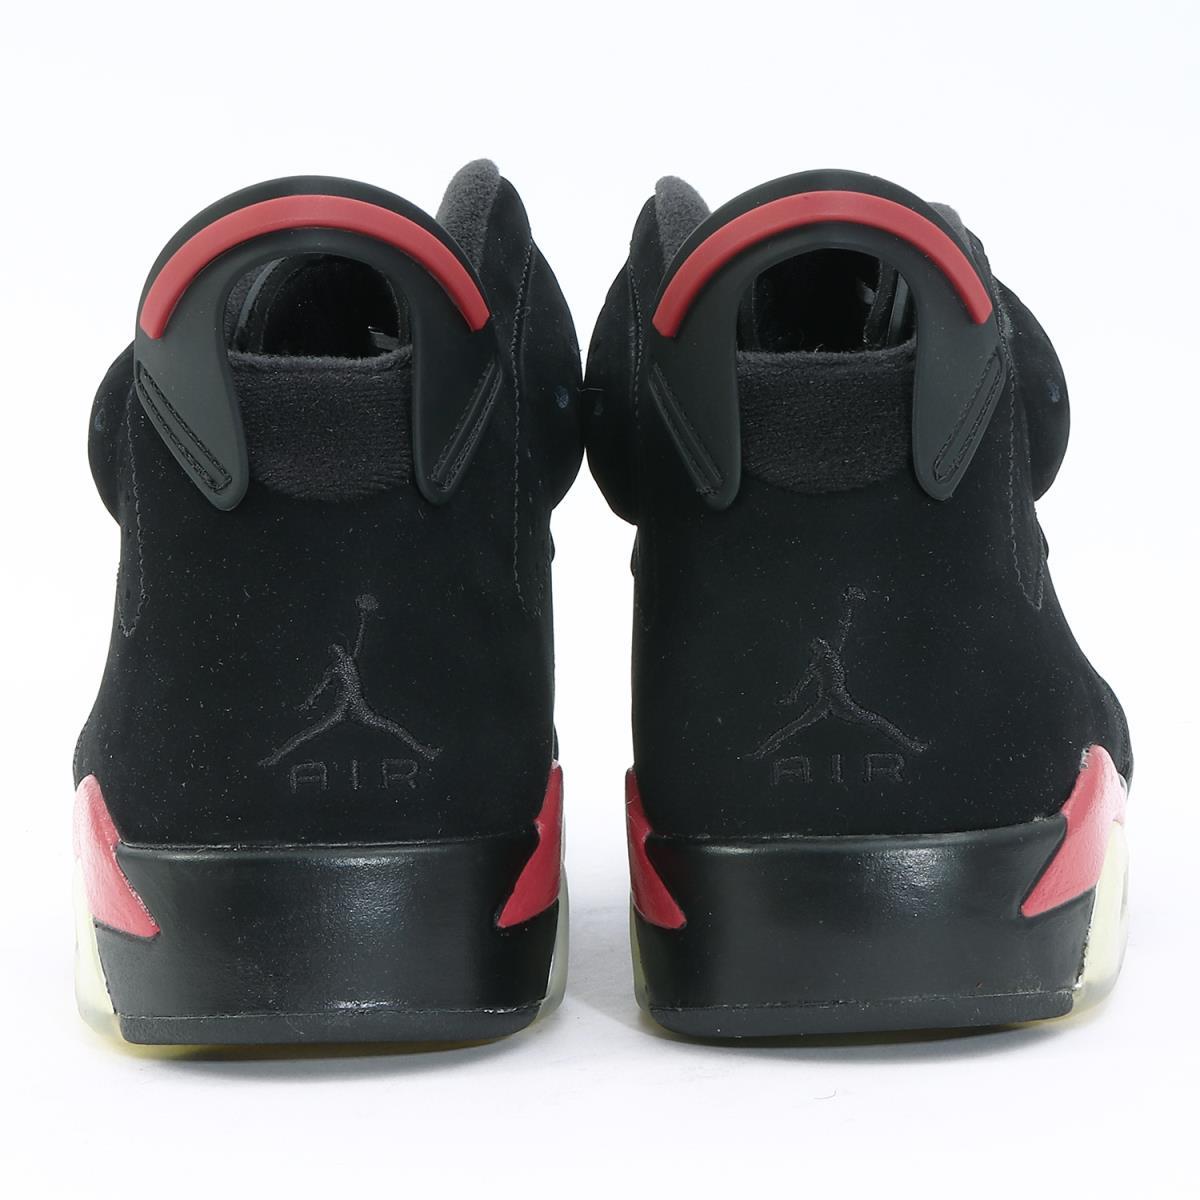 cda1fd8c9ebb BEEGLE by Boo-Bee  NIKE (Nike) AIR JORDAN 6 RETRO VARSITY RED ...